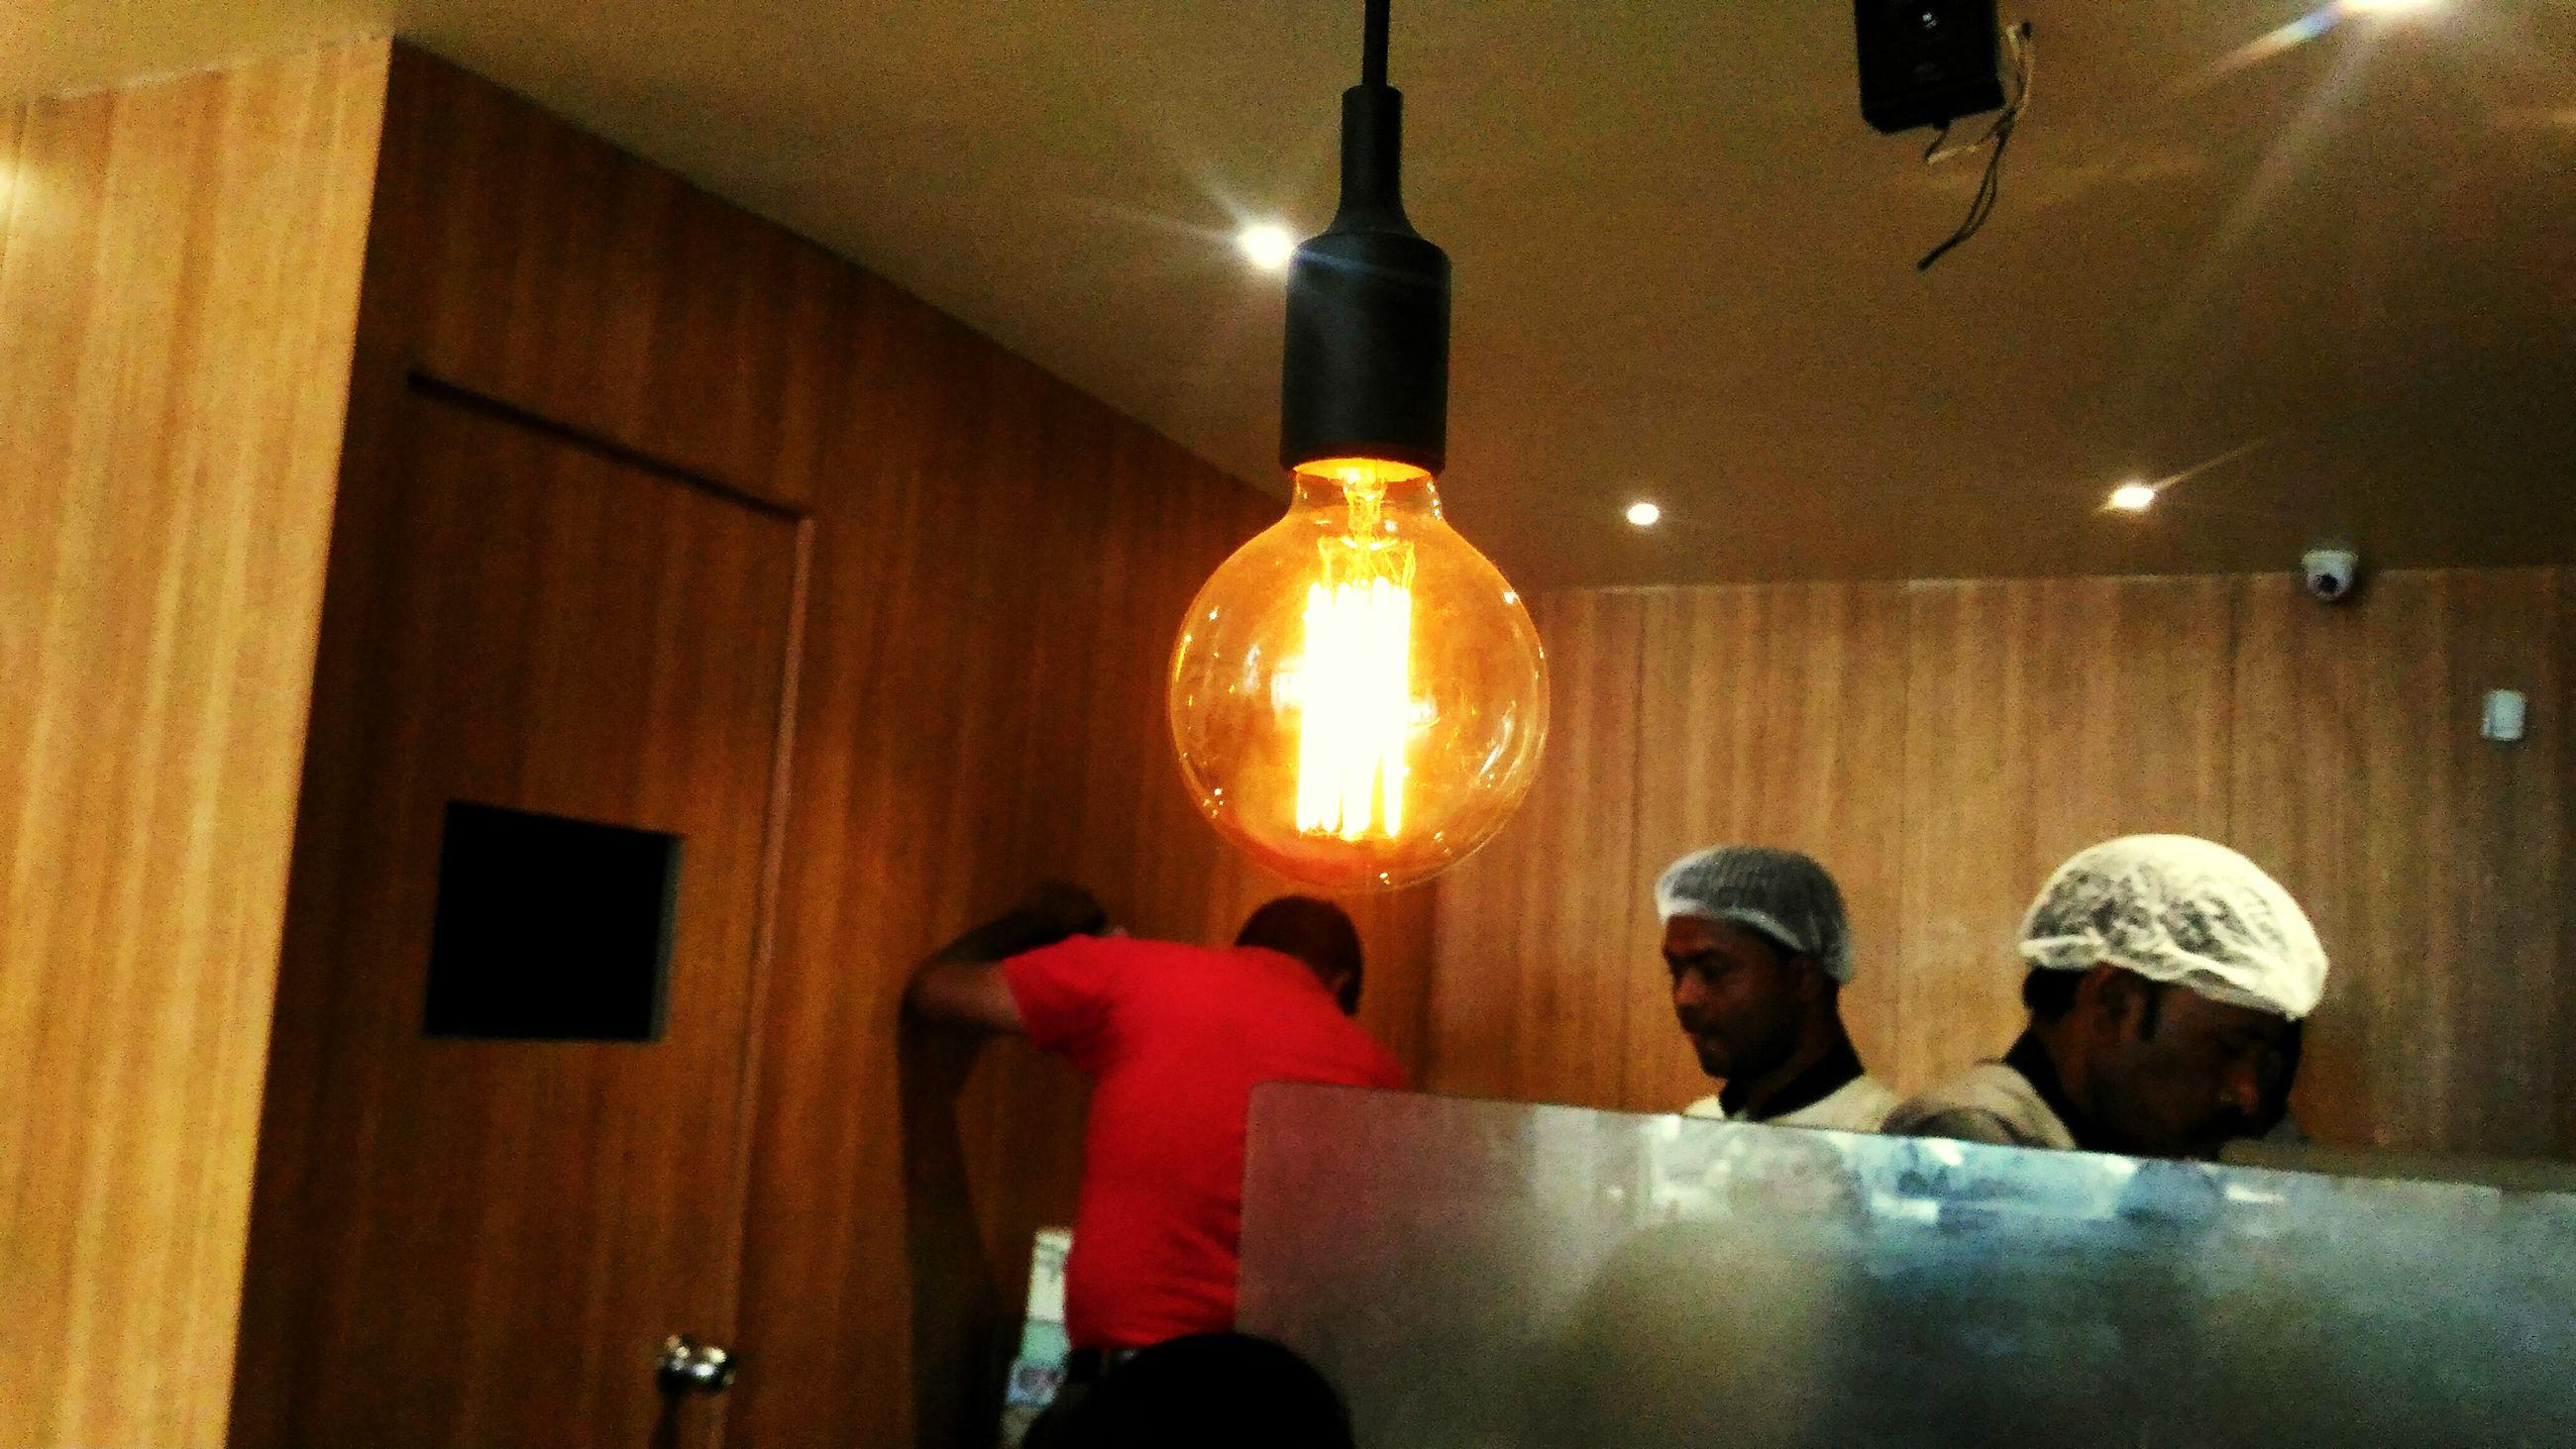 illuminated, indoors, lighting equipment, bar - drink establishment, electric light